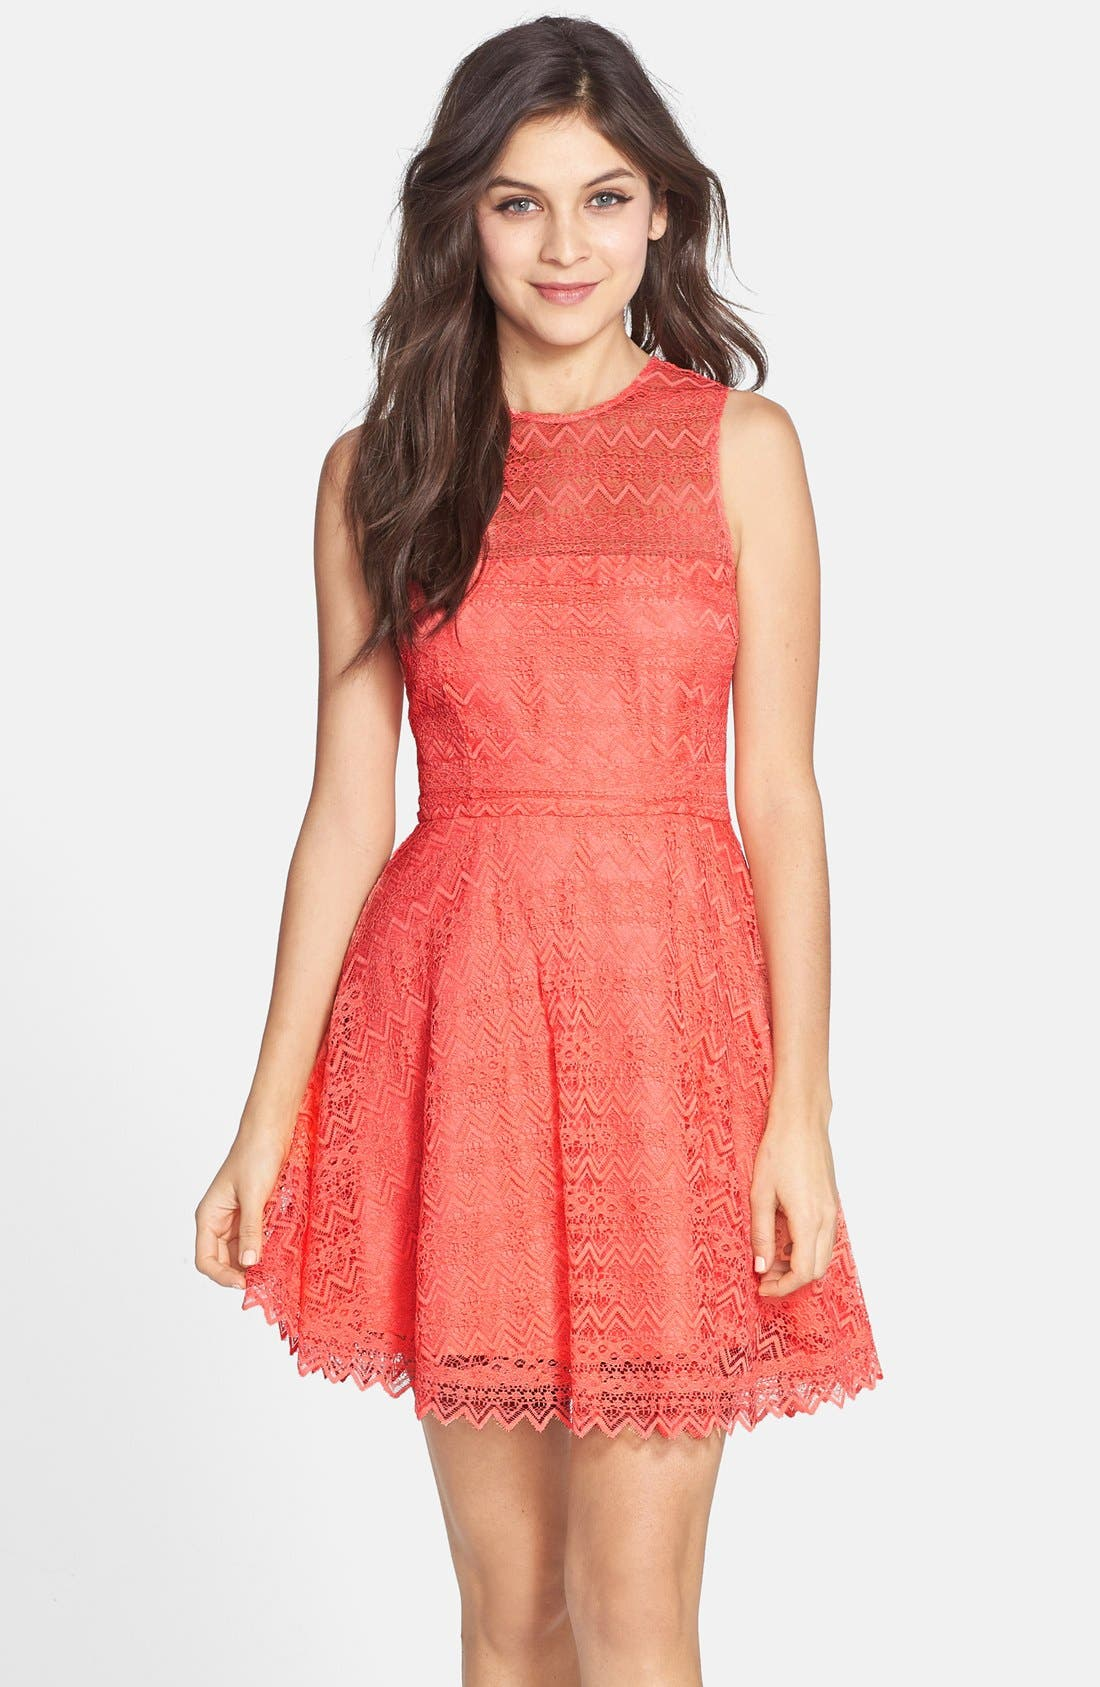 Alternate Image 1 Selected - BB Dakota Zigzag Lace Fit & Flare Dress